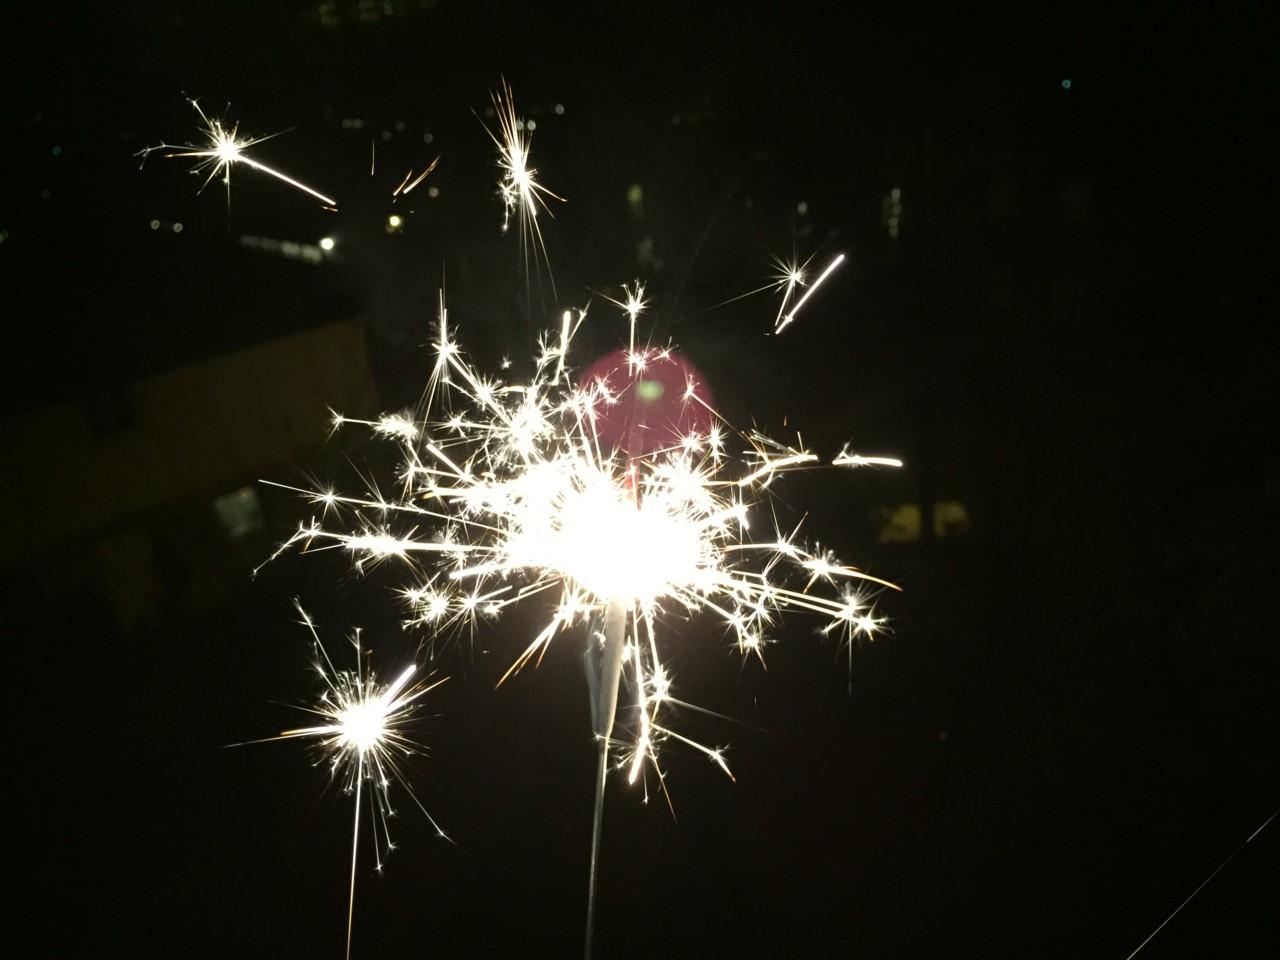 stjerneskudd-sparkler-new-years-eve